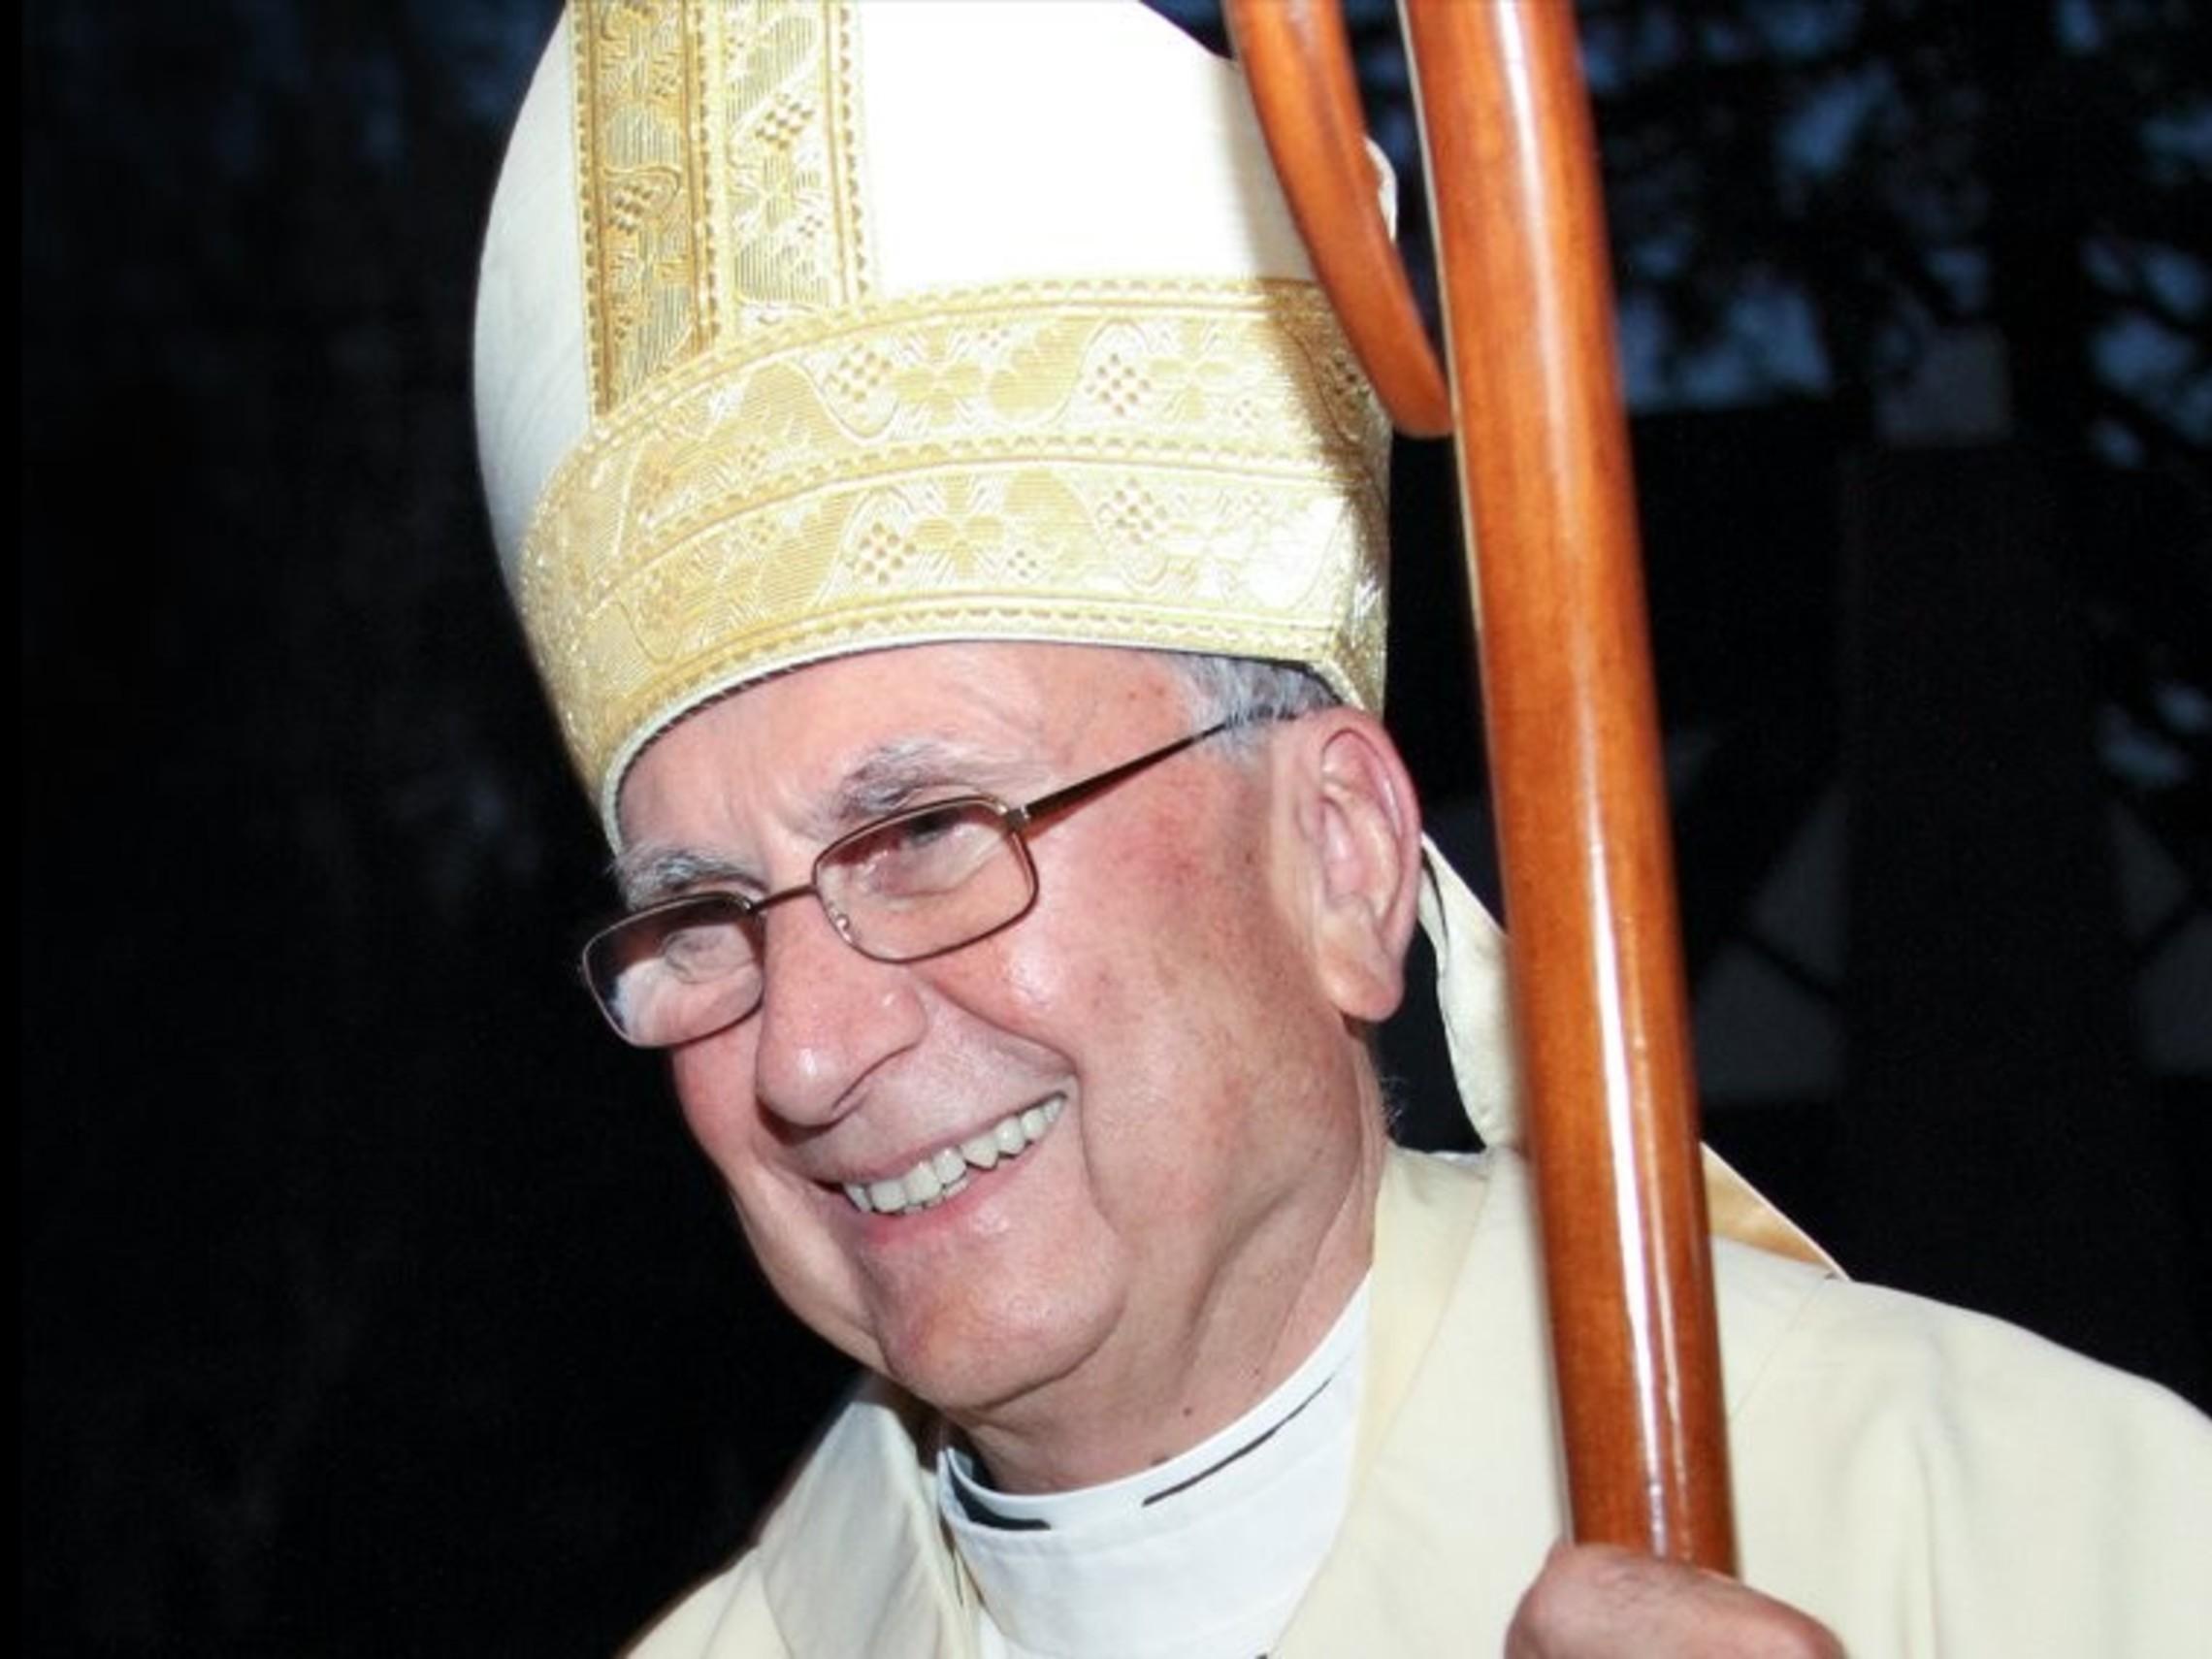 Bishop Blaire